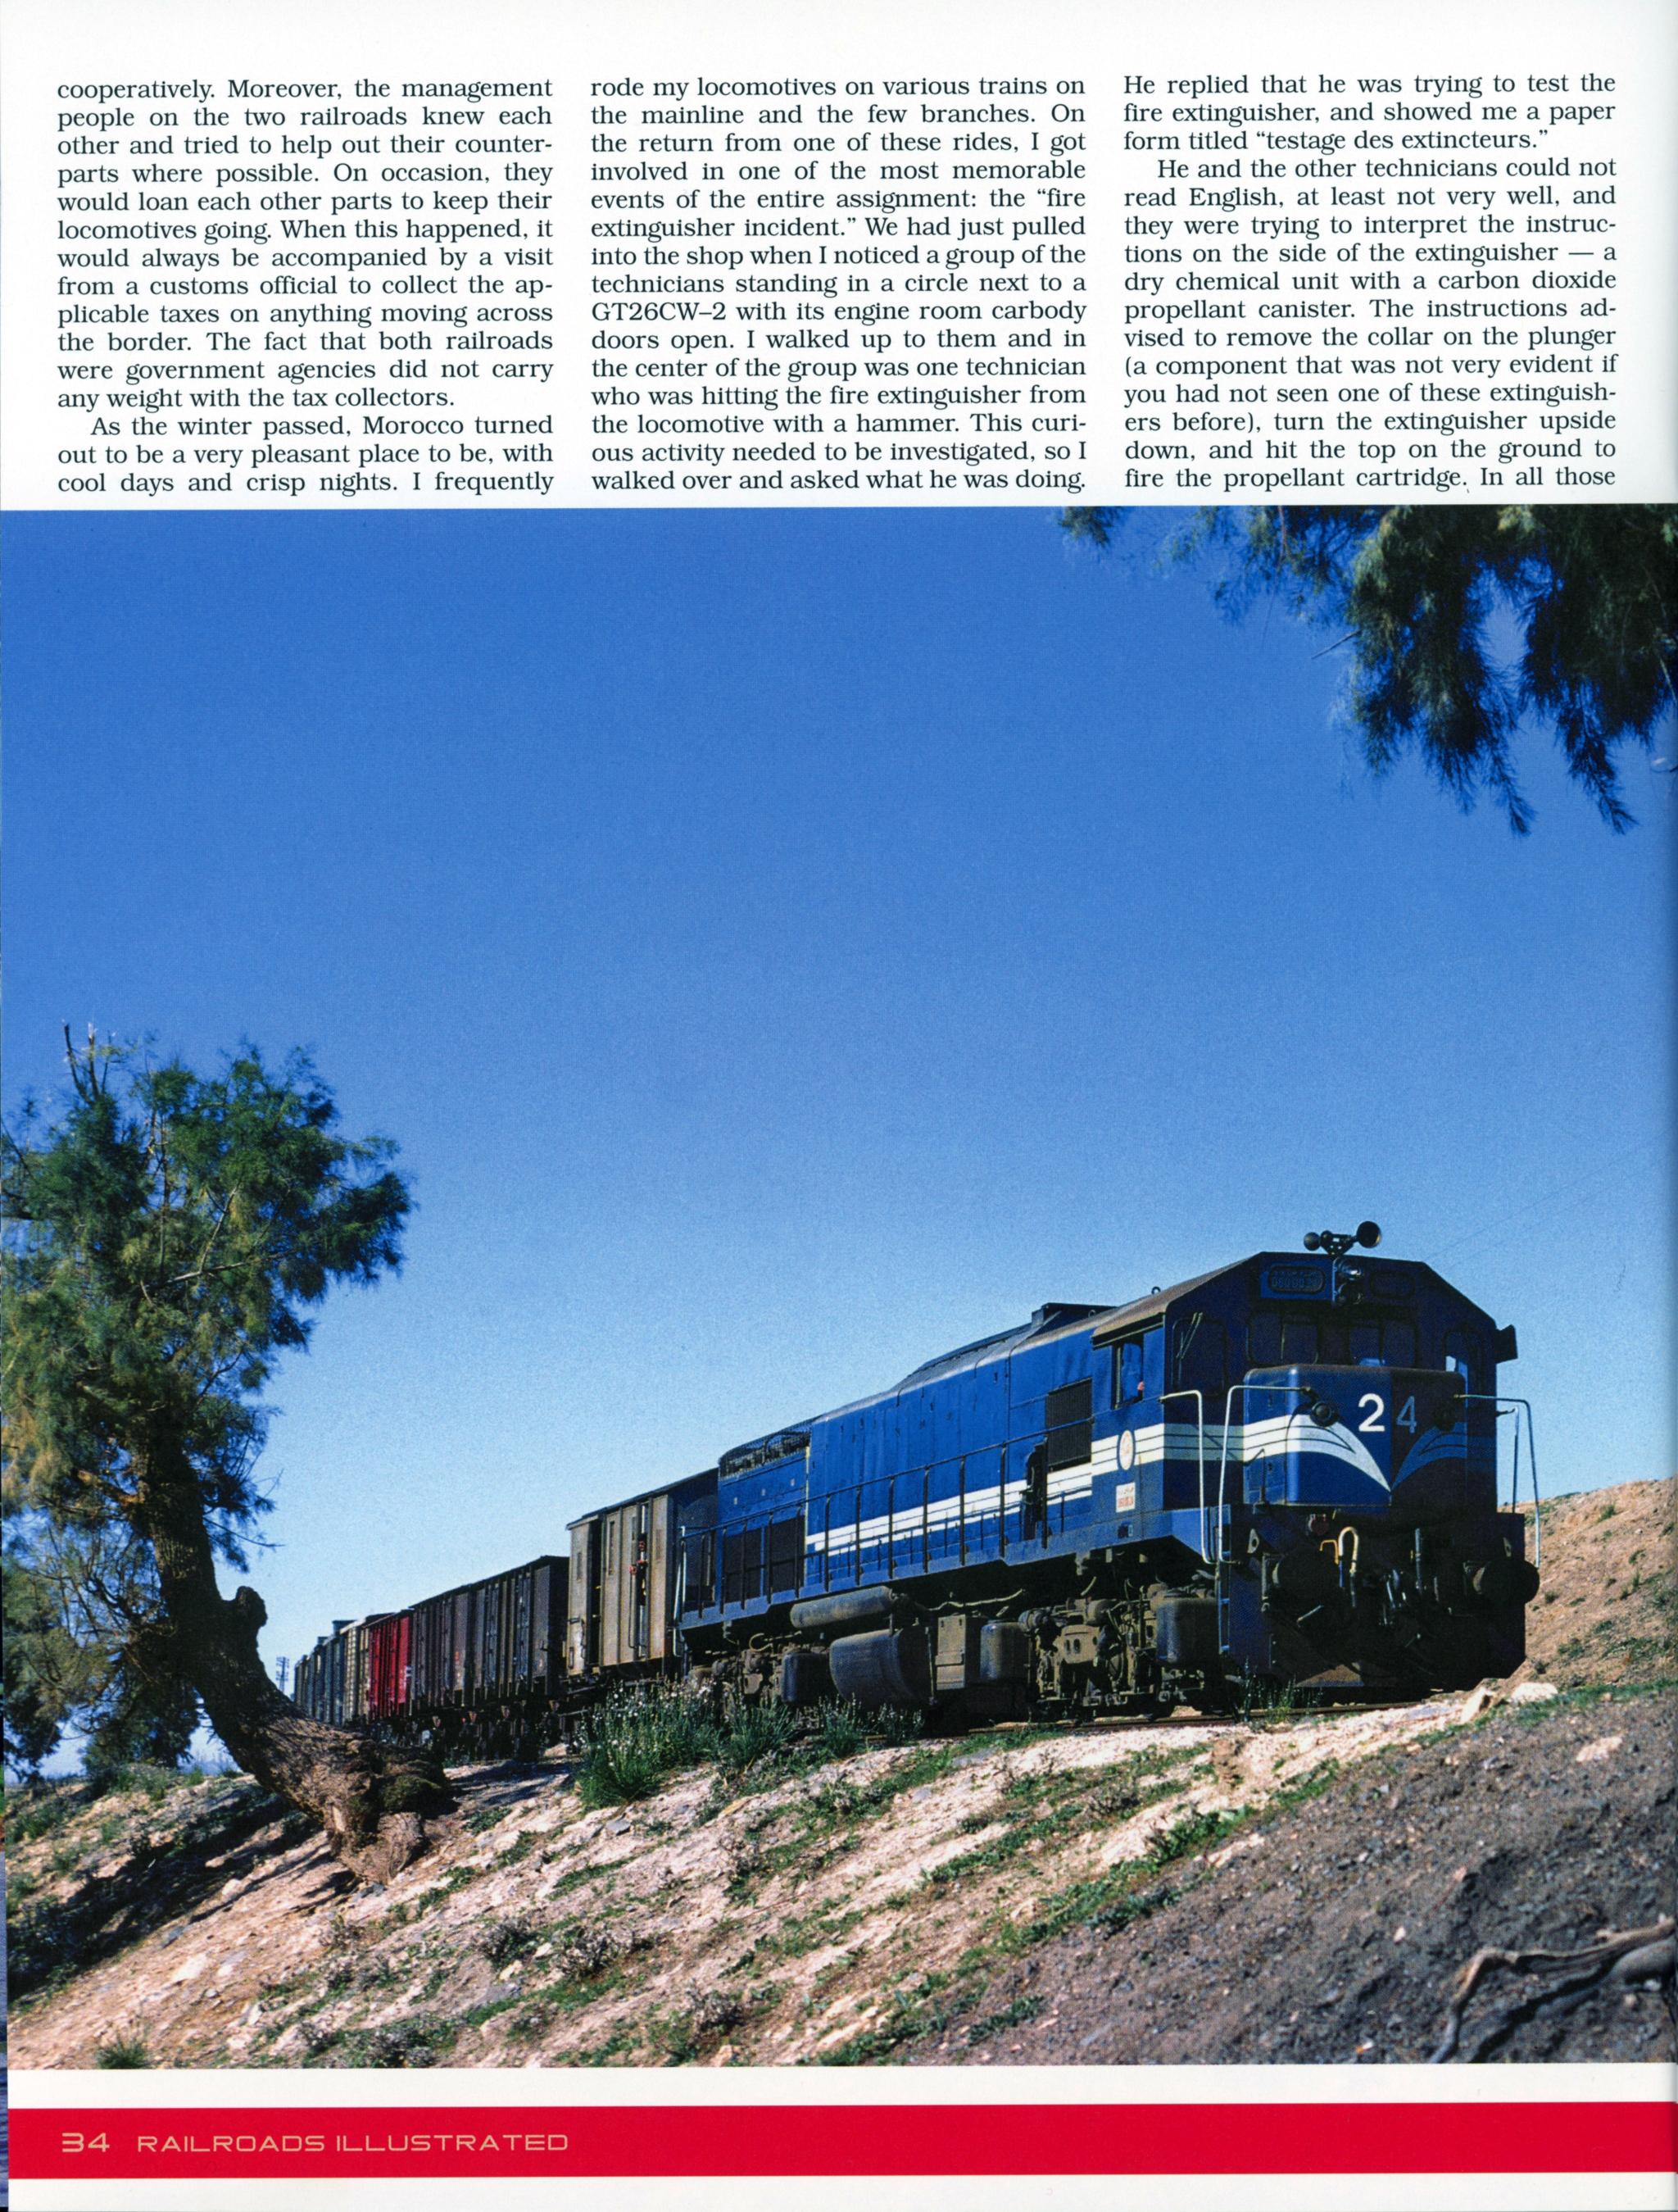 Chemins de Fer au Maroc - ONCF  - Page 5 49775572901_a6cd31e00a_o_d